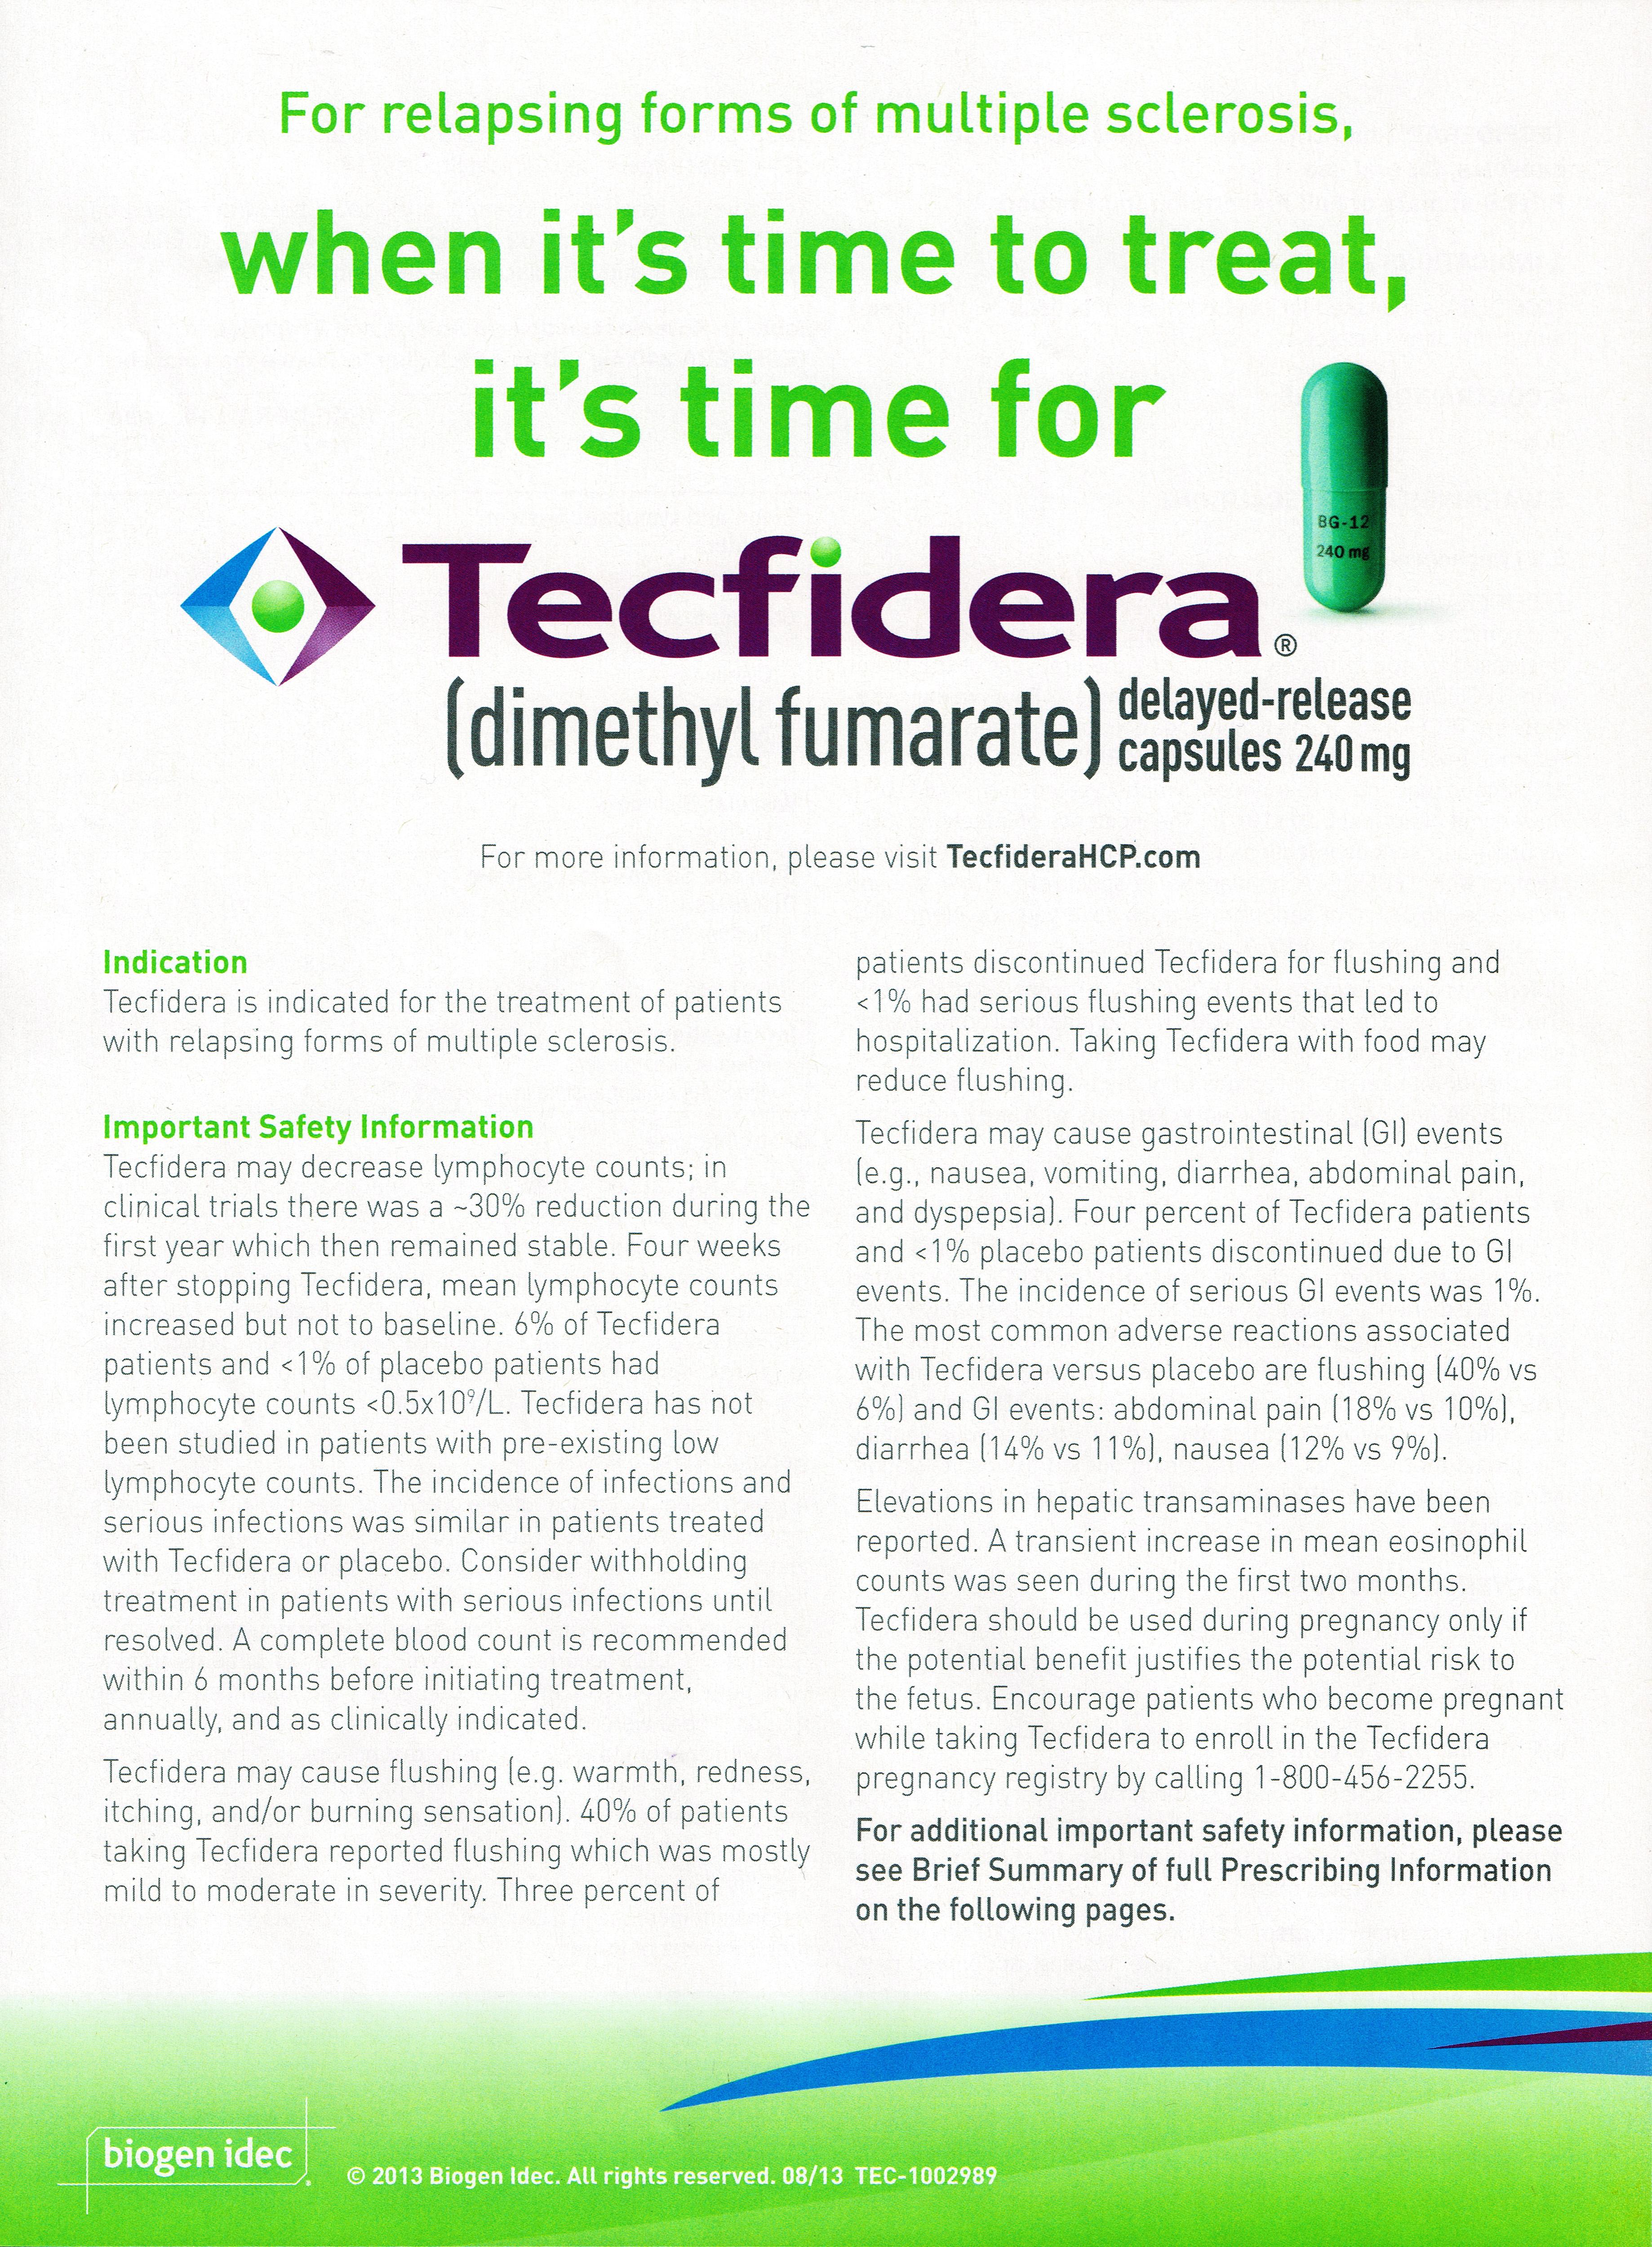 TECFIDERA | Concept Diagnosis